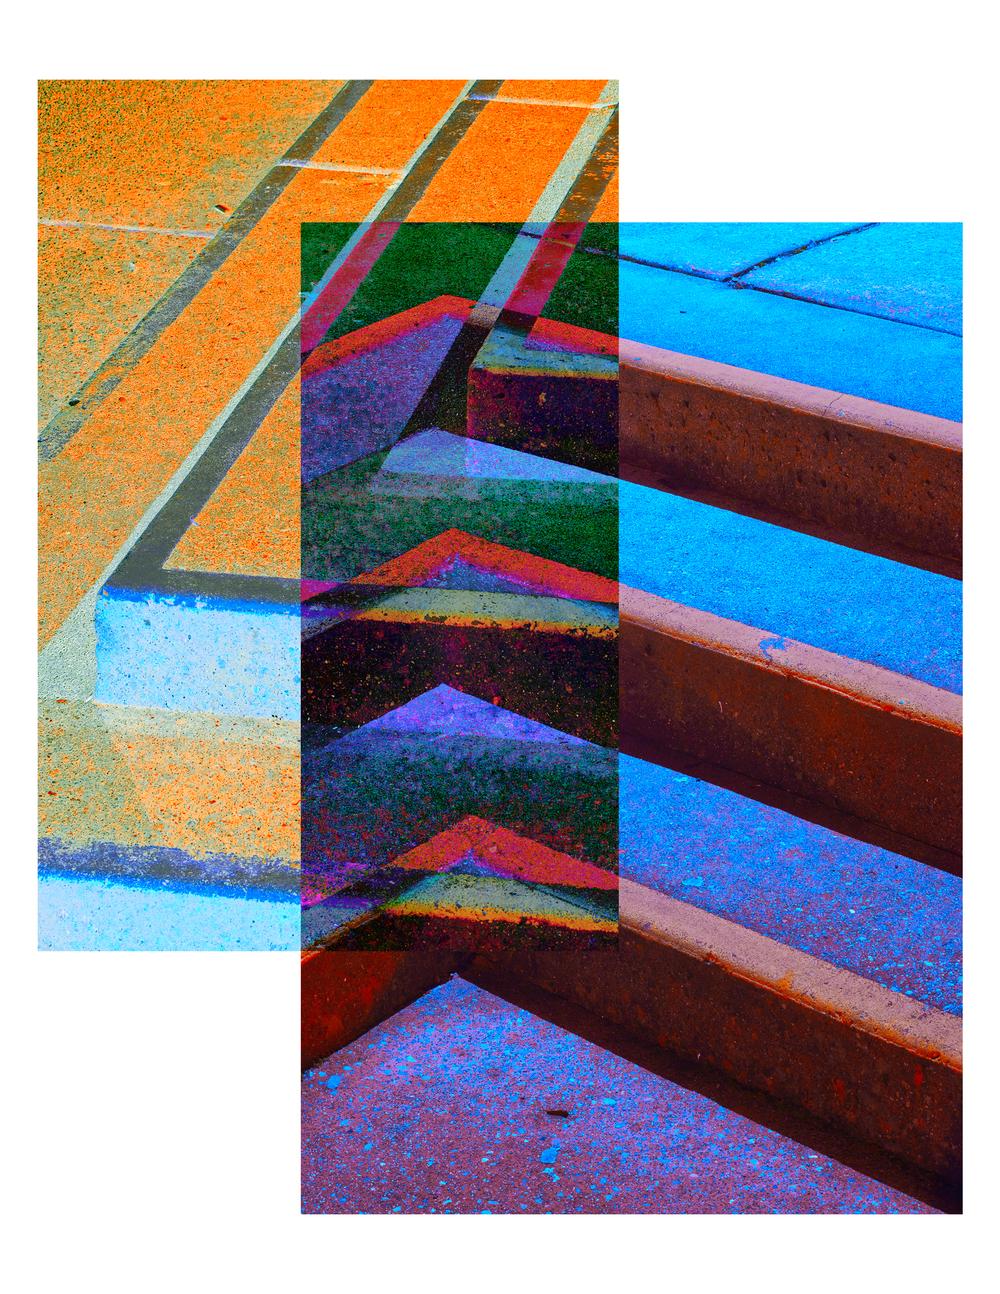 Untitled-10-a.jpg